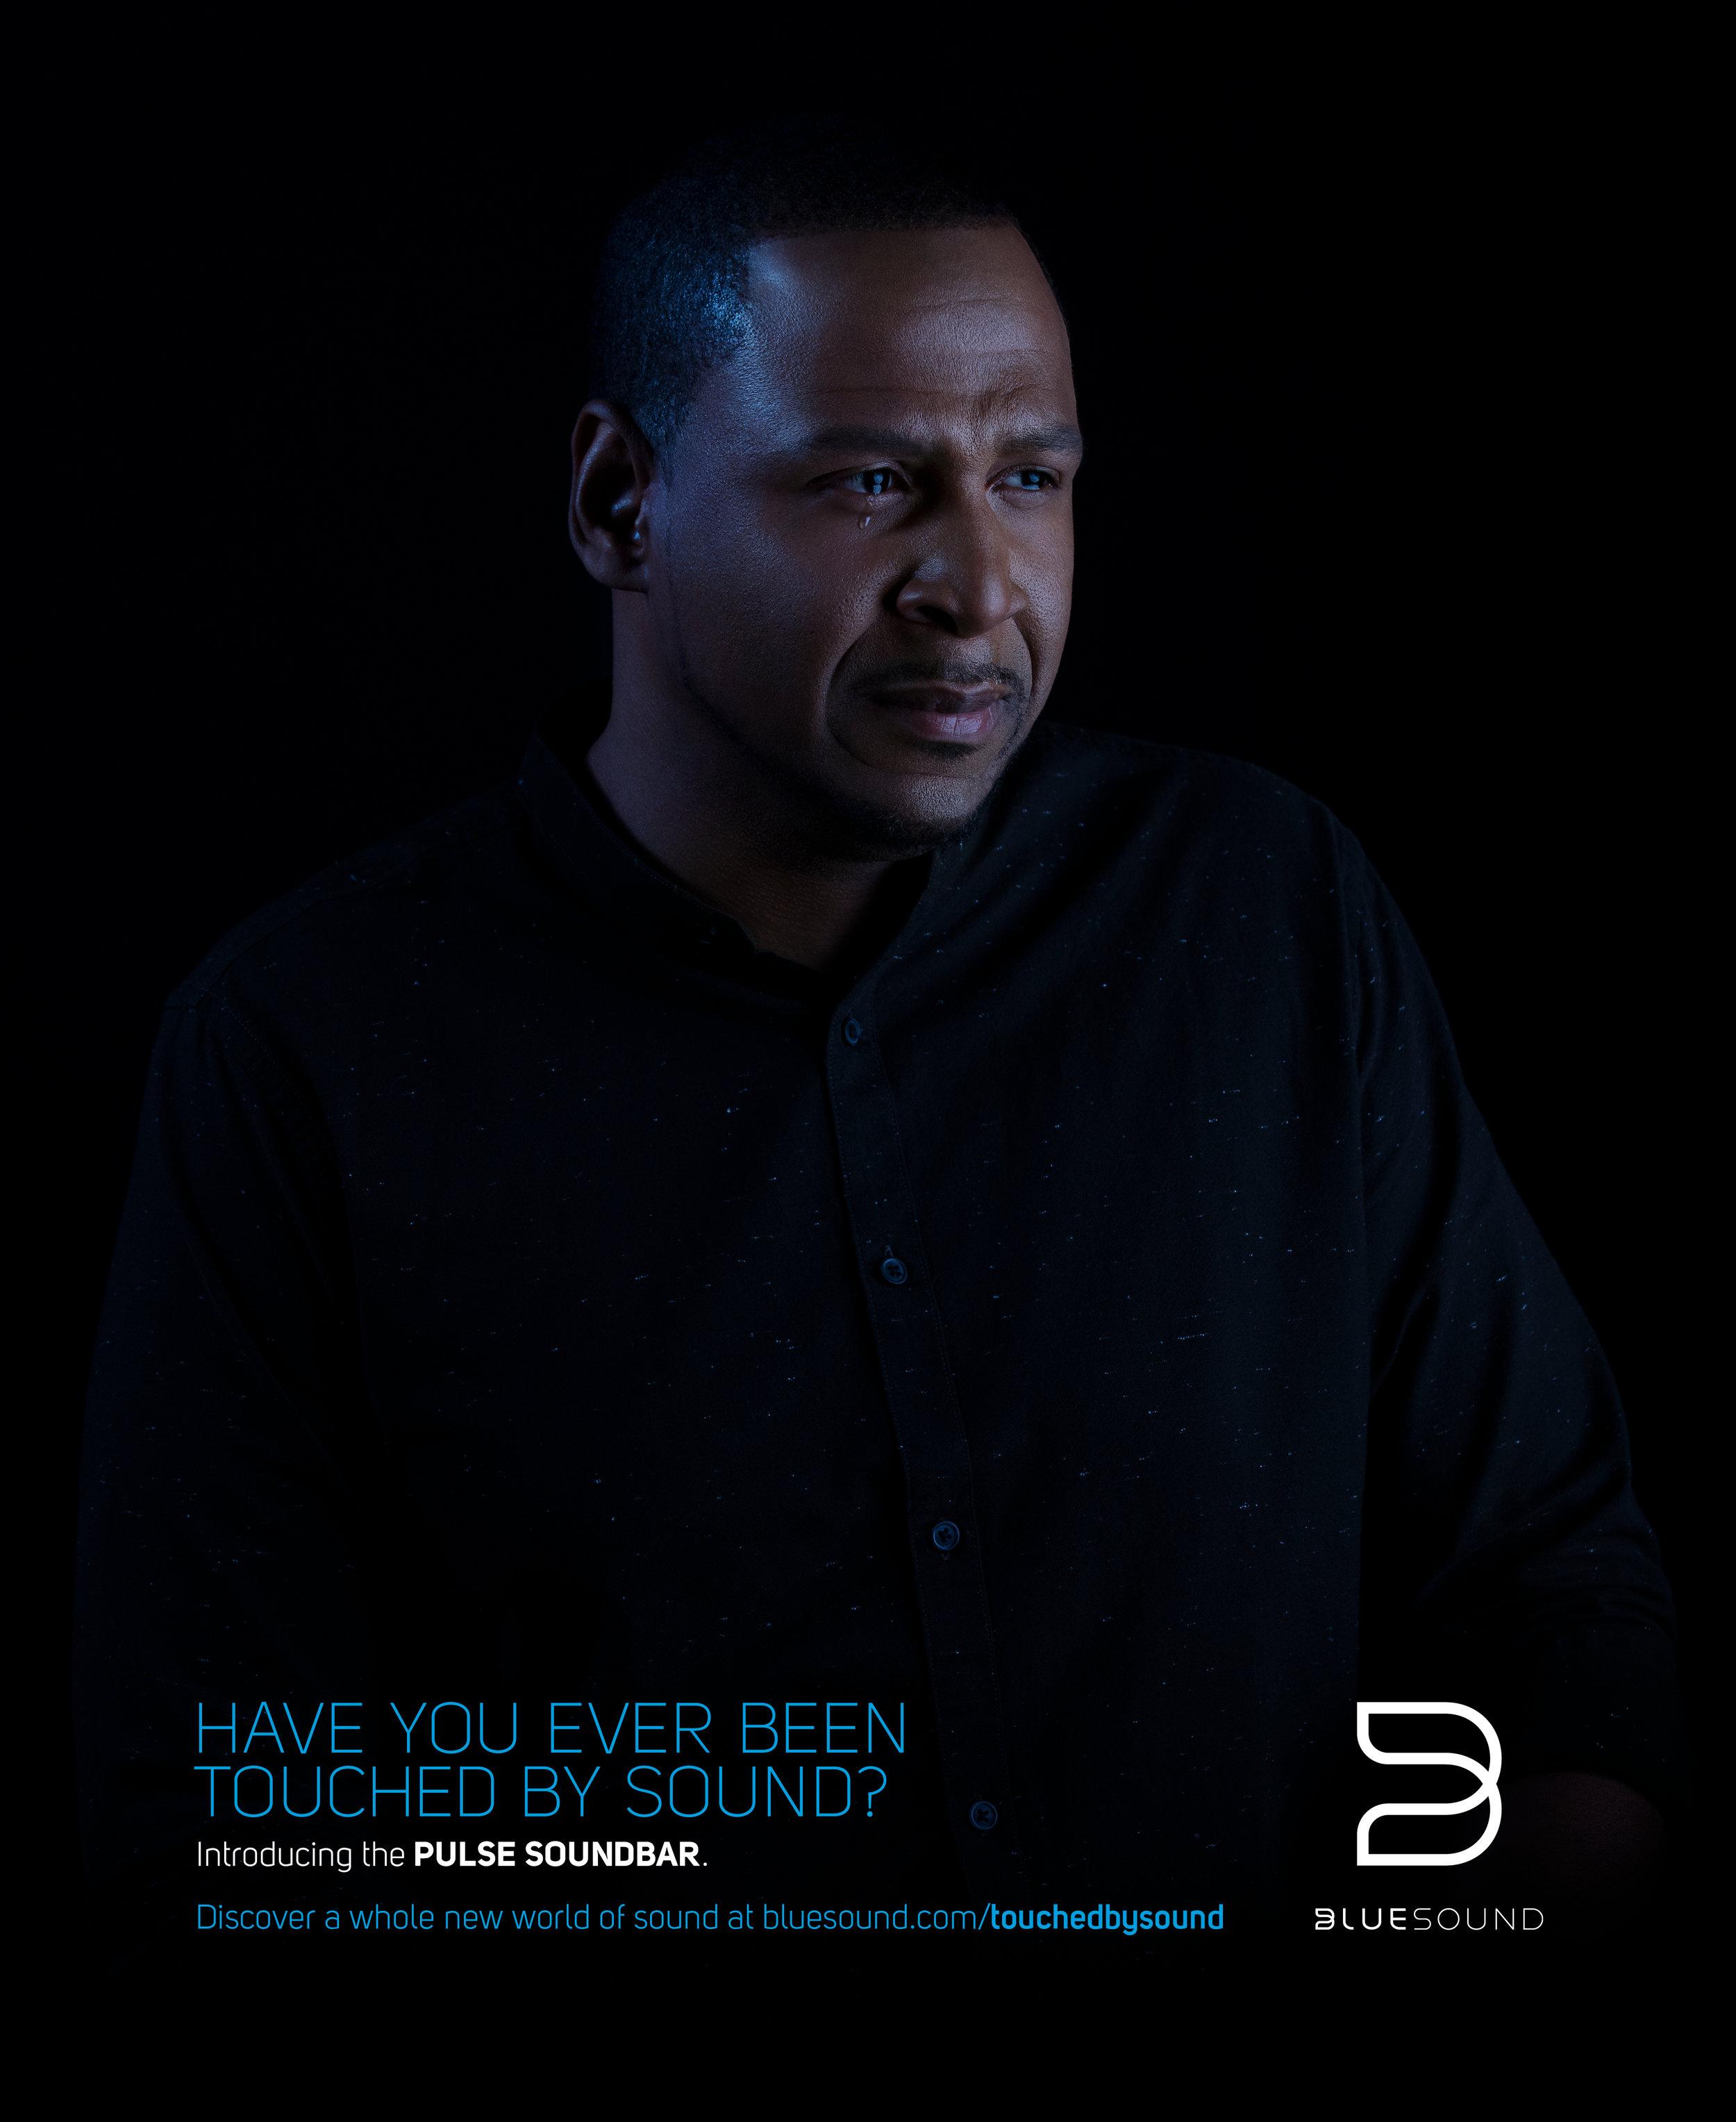 Bluesound_TouchedBySound_Campaign_PRINT_021.jpg